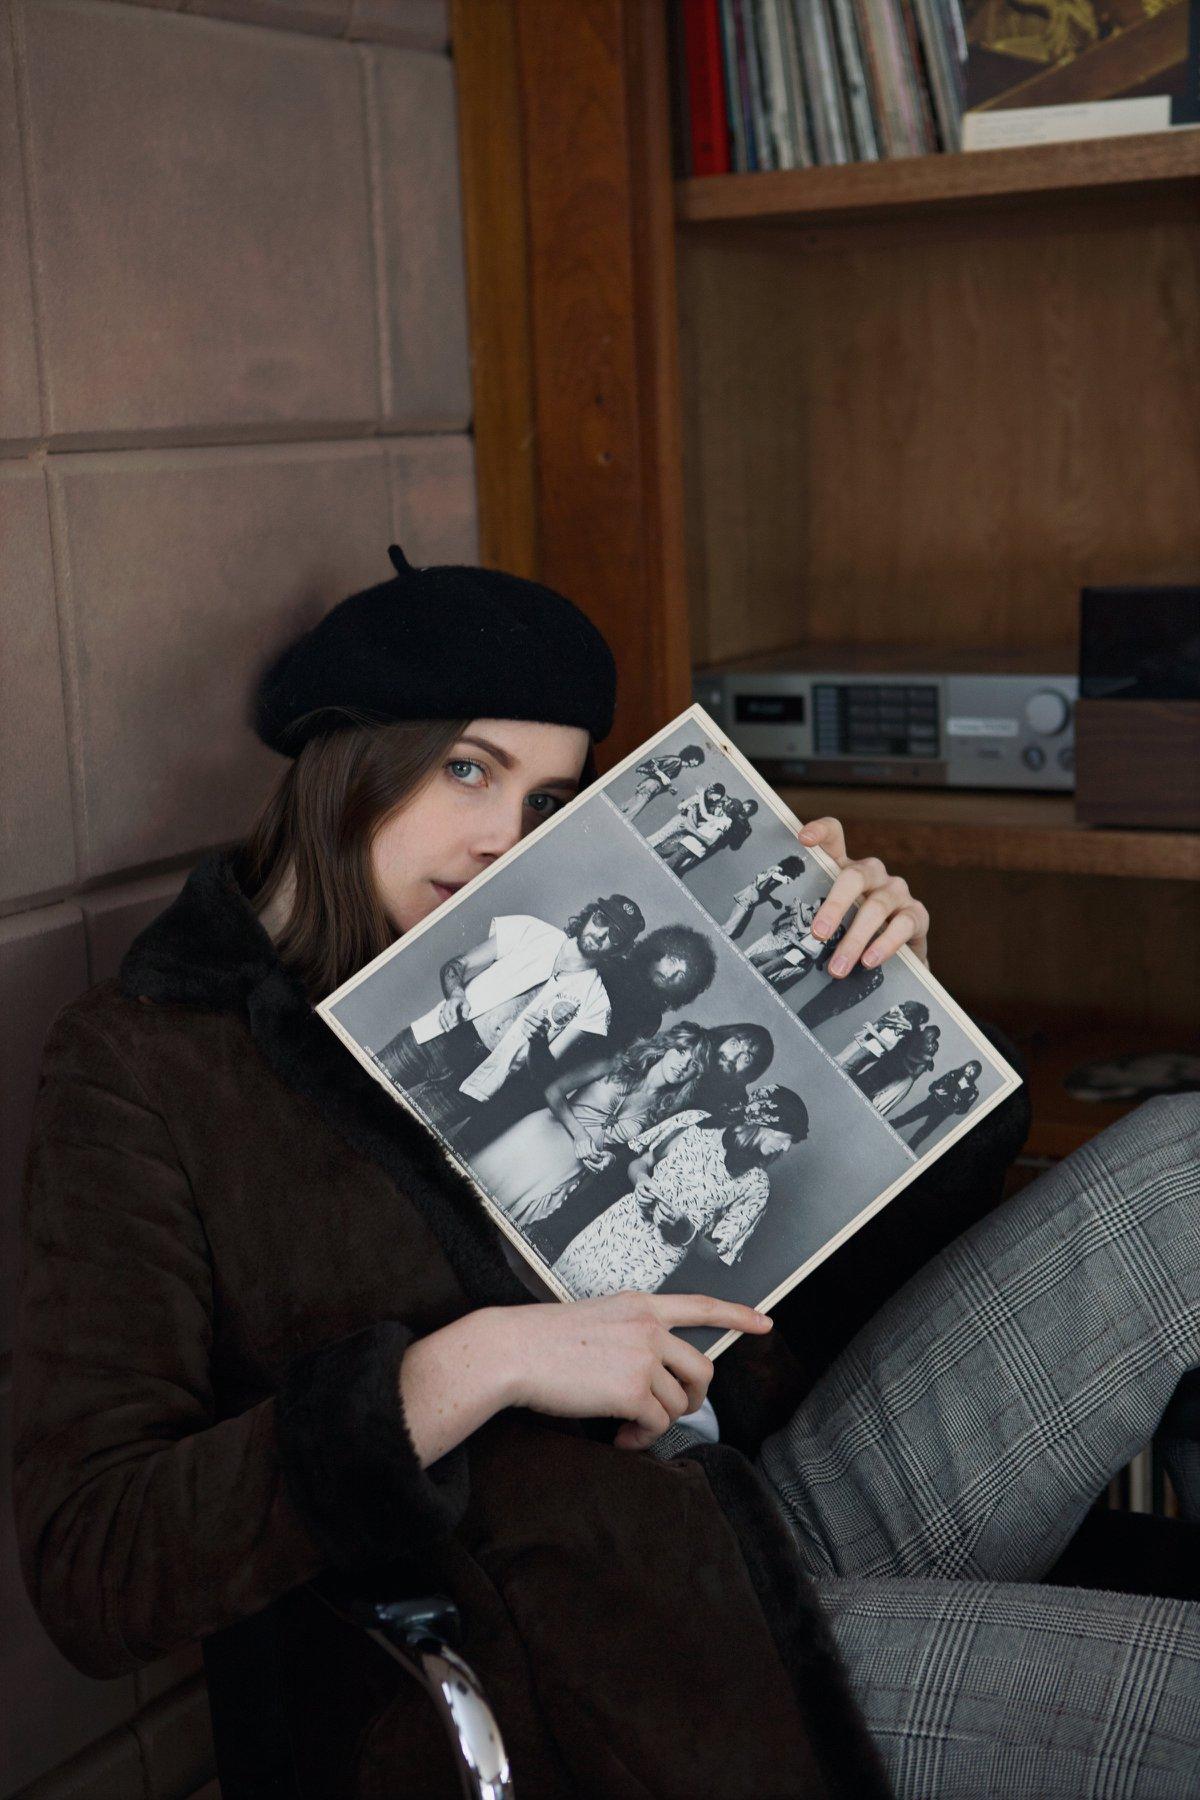 fur coat fashion portrait eppsetin house frank lloyd wright midcentury modern vinyl record